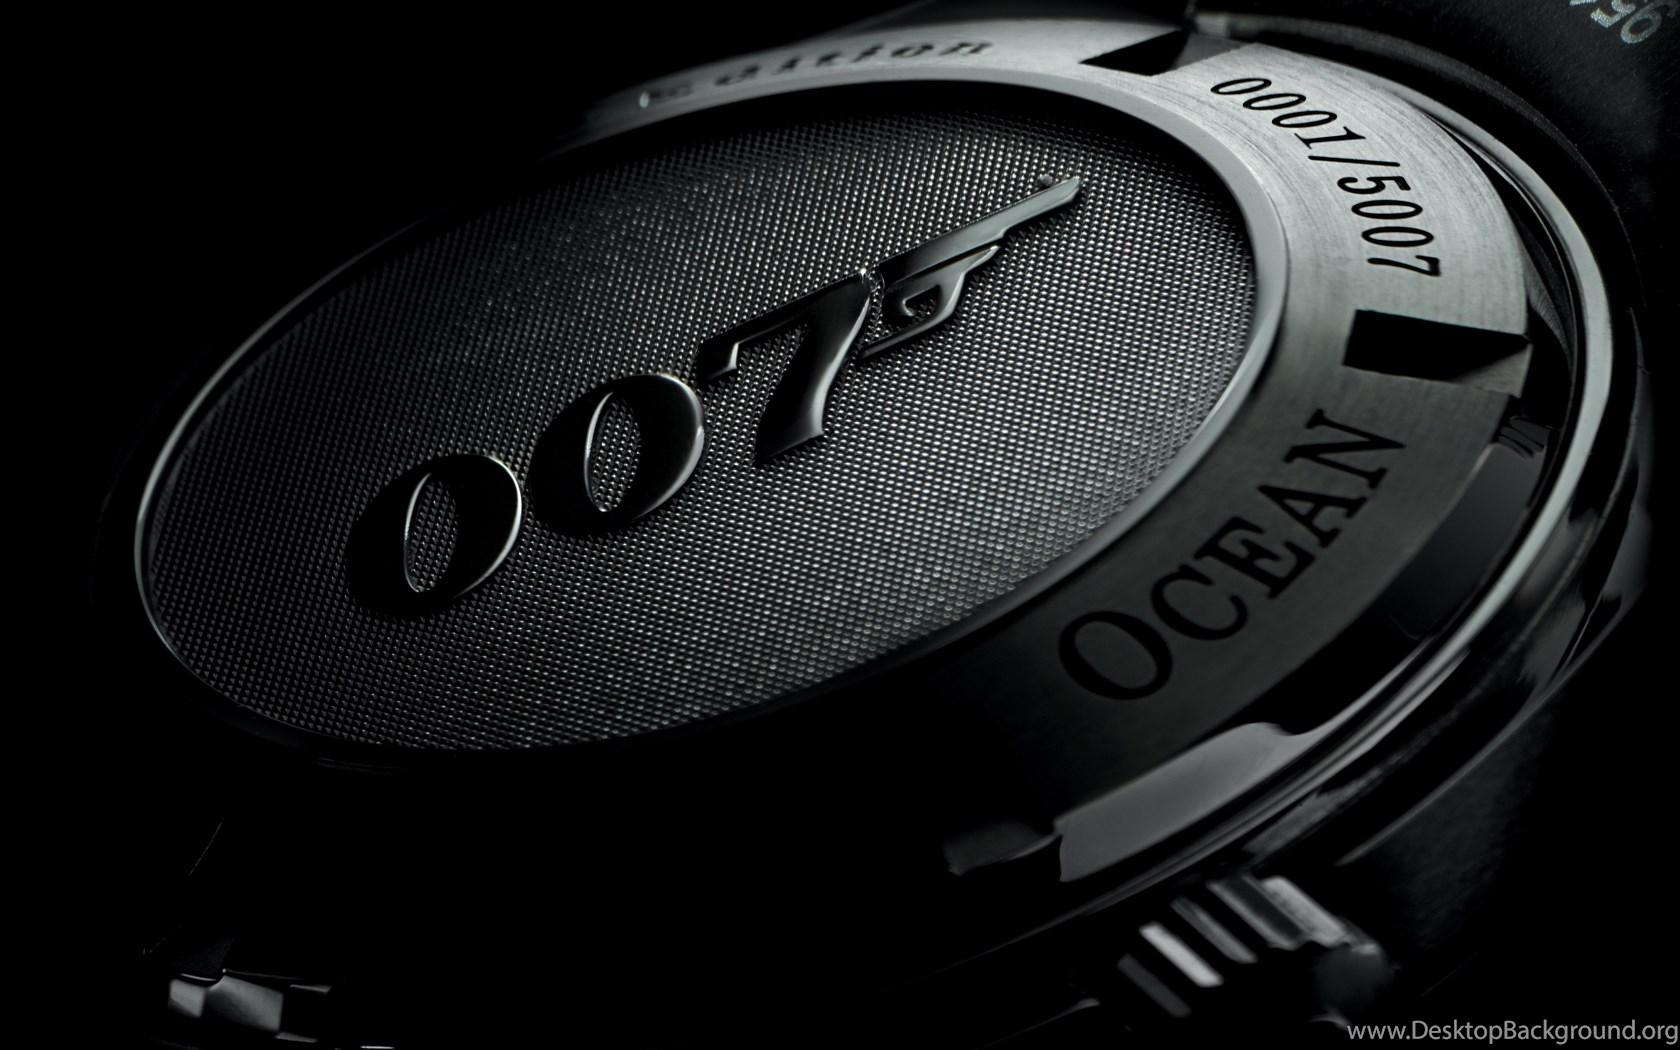 Download james bond 007 logo wallpapers for windows - James bond wallpaper iphone 5 ...